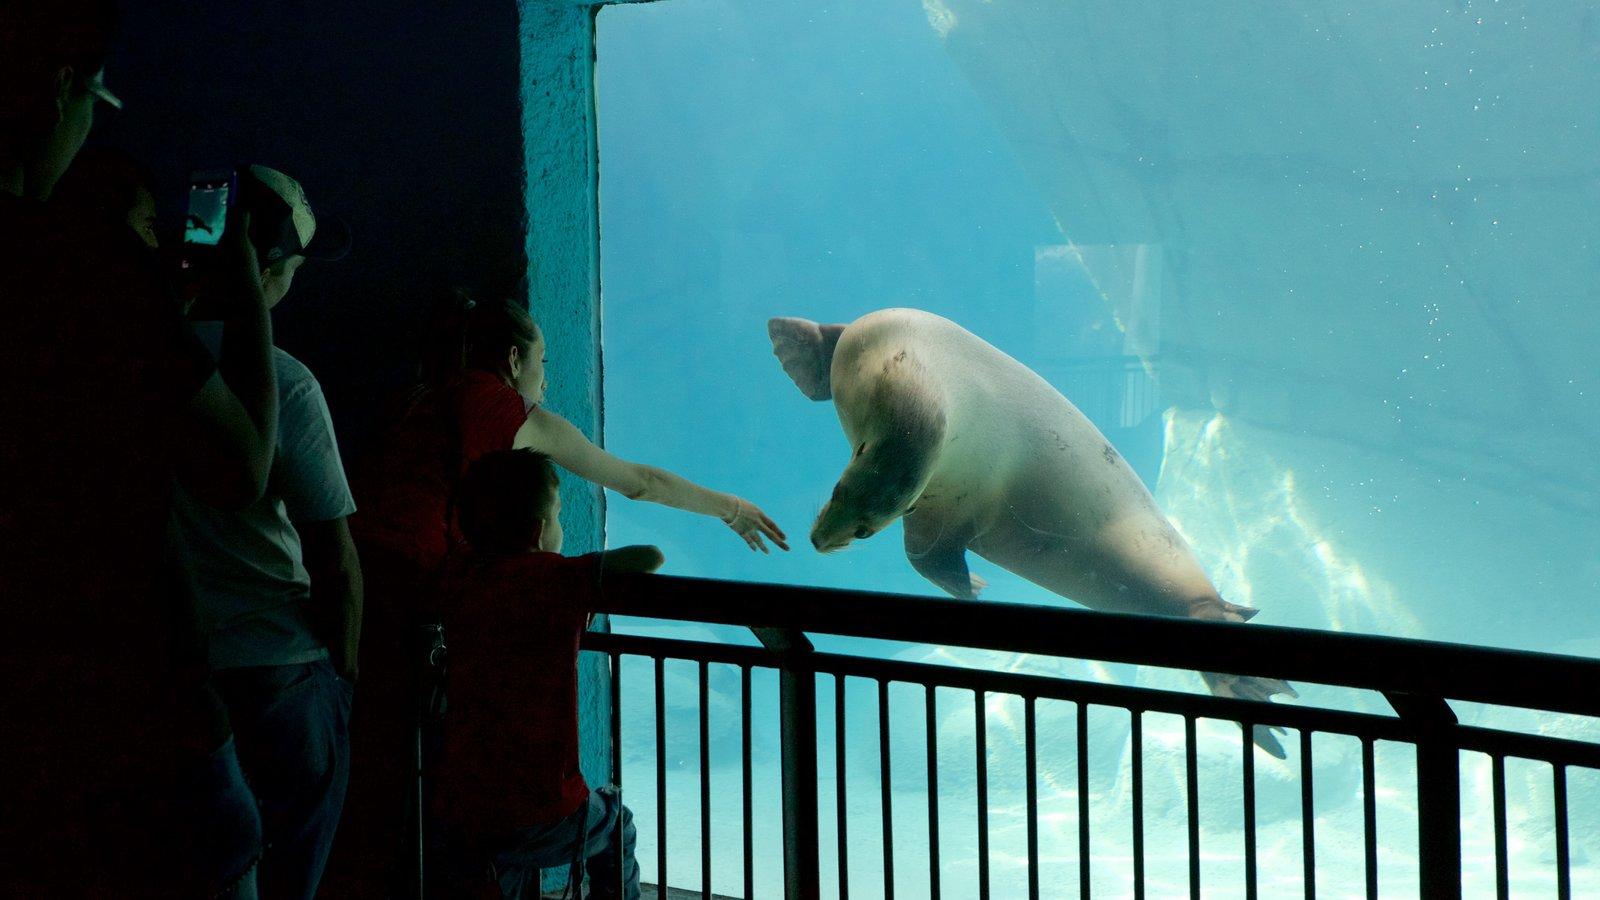 Parque Zoologico de Chapultepec featuring interior views, marine life and zoo animals